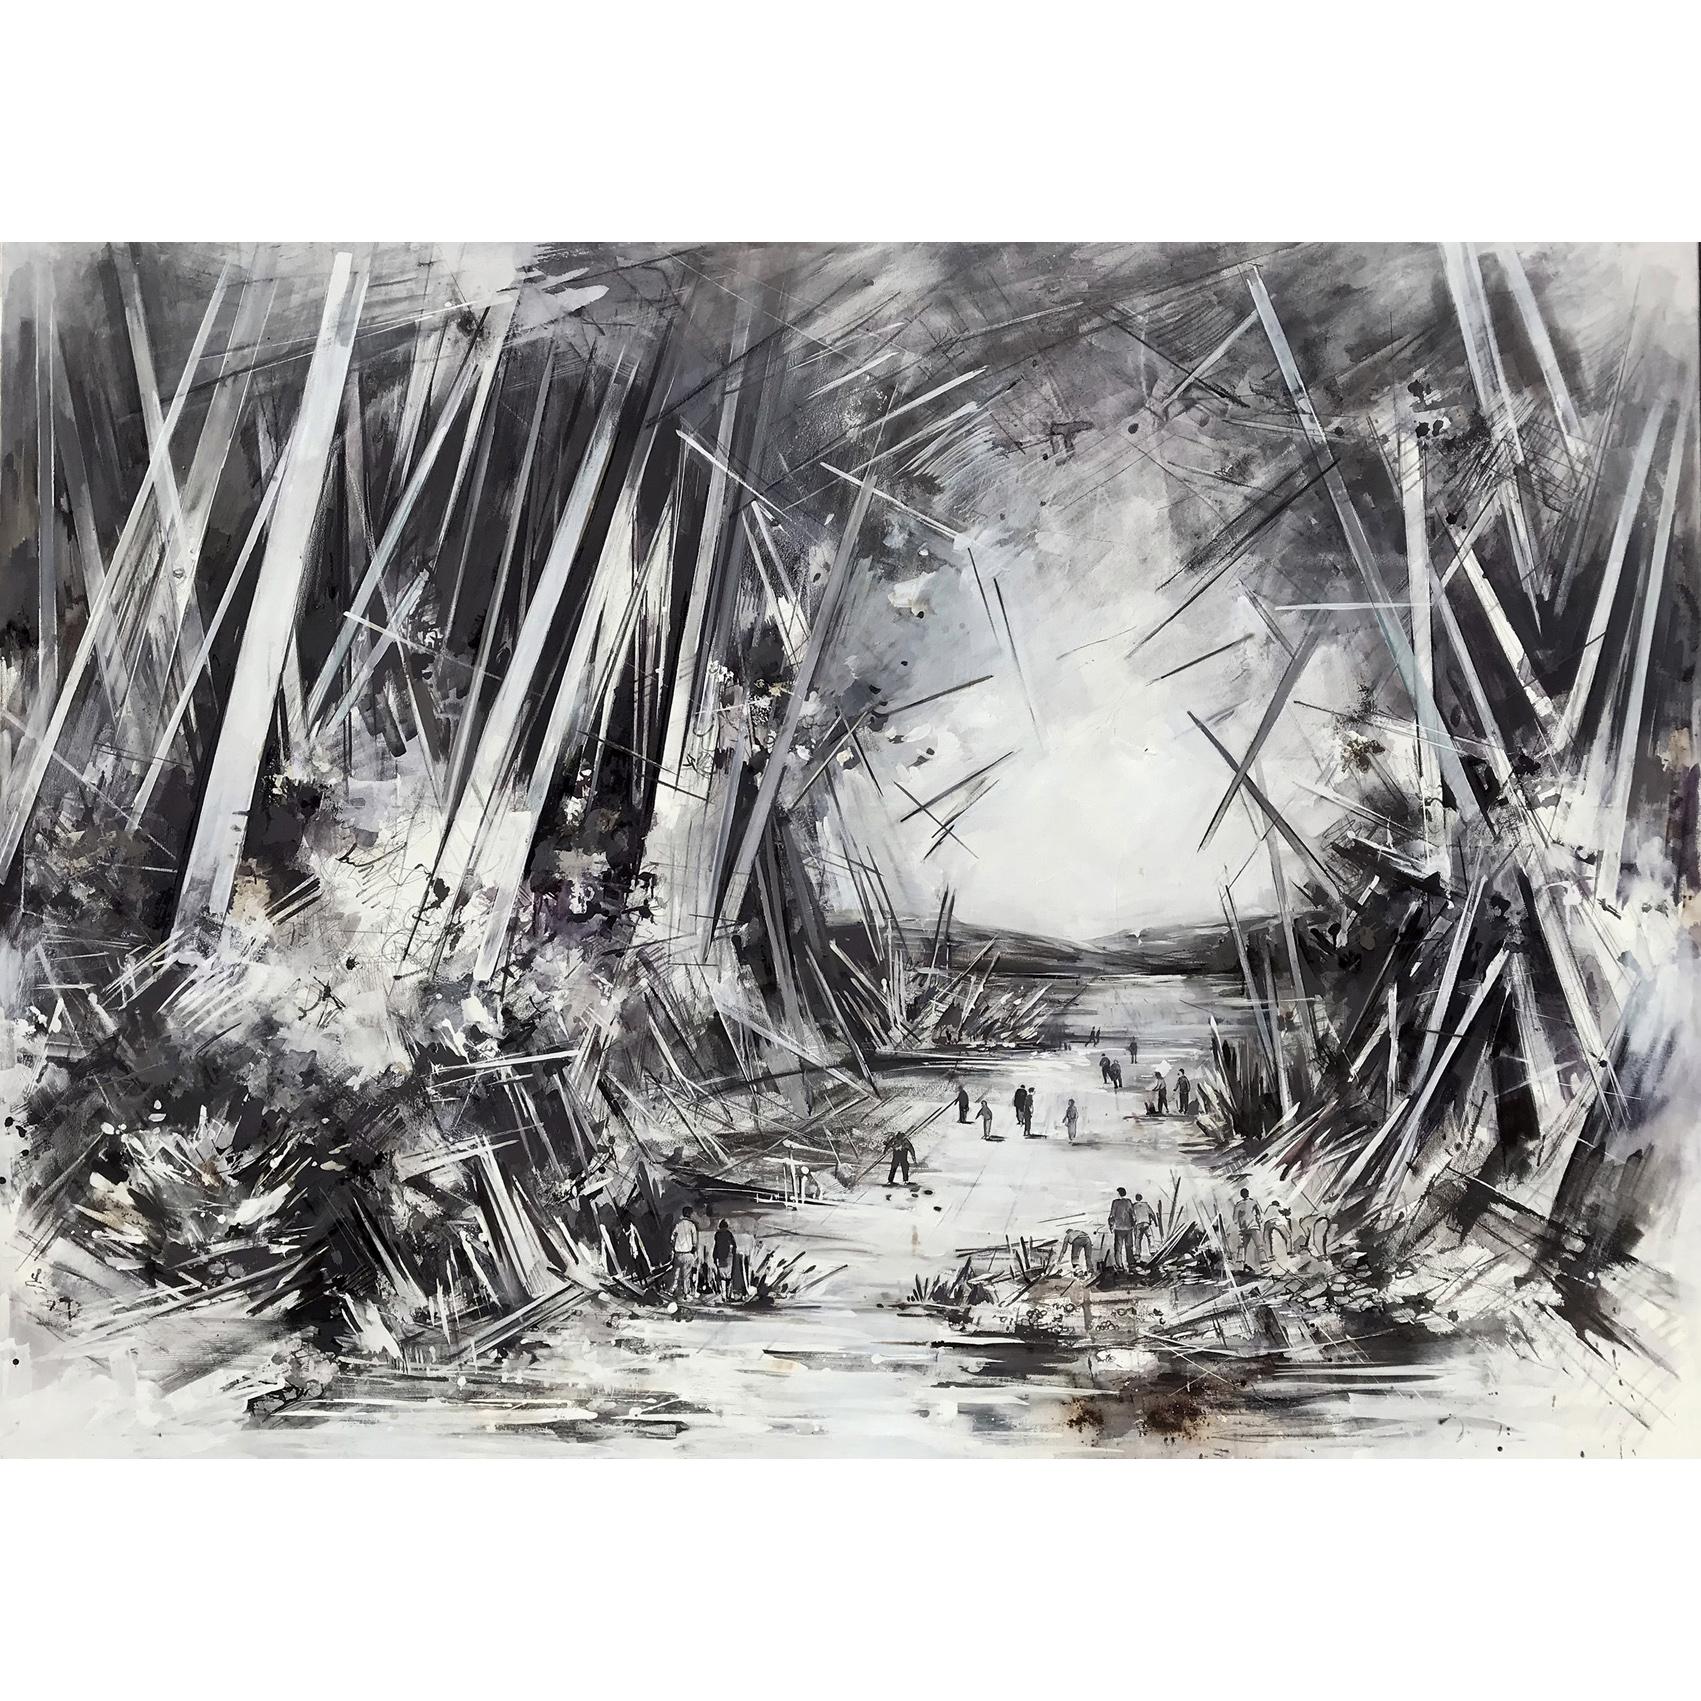 Utopia XVII, 170 x 245 cm,  Öl auf Leinwand,  2019